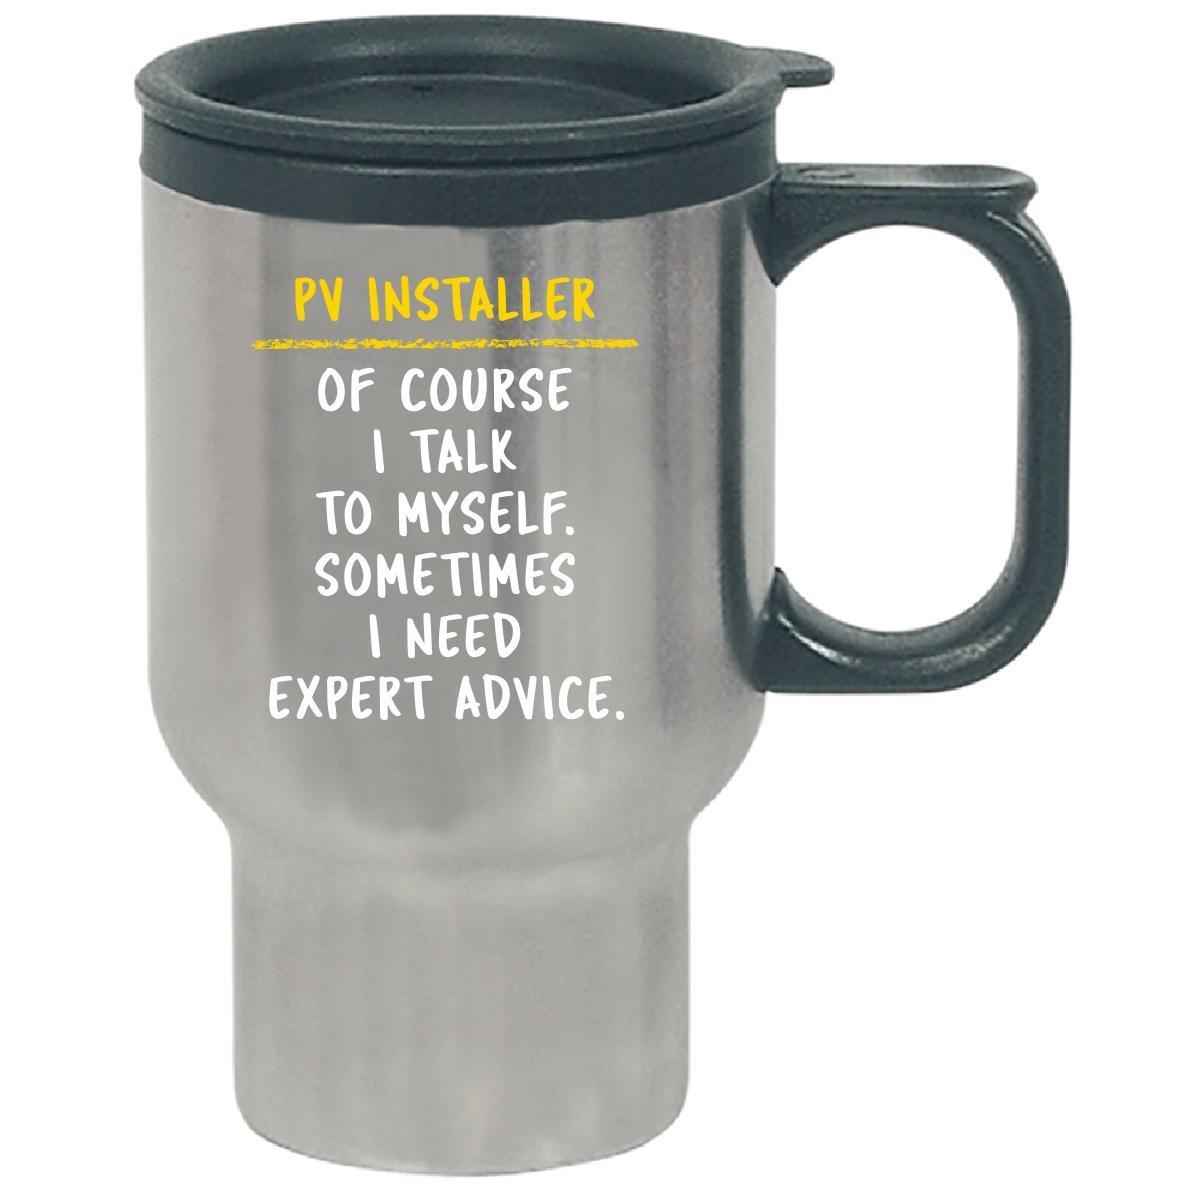 Pv Installer Expert Advice Sarcastic Funny Saying Solar Gift - Travel Mug